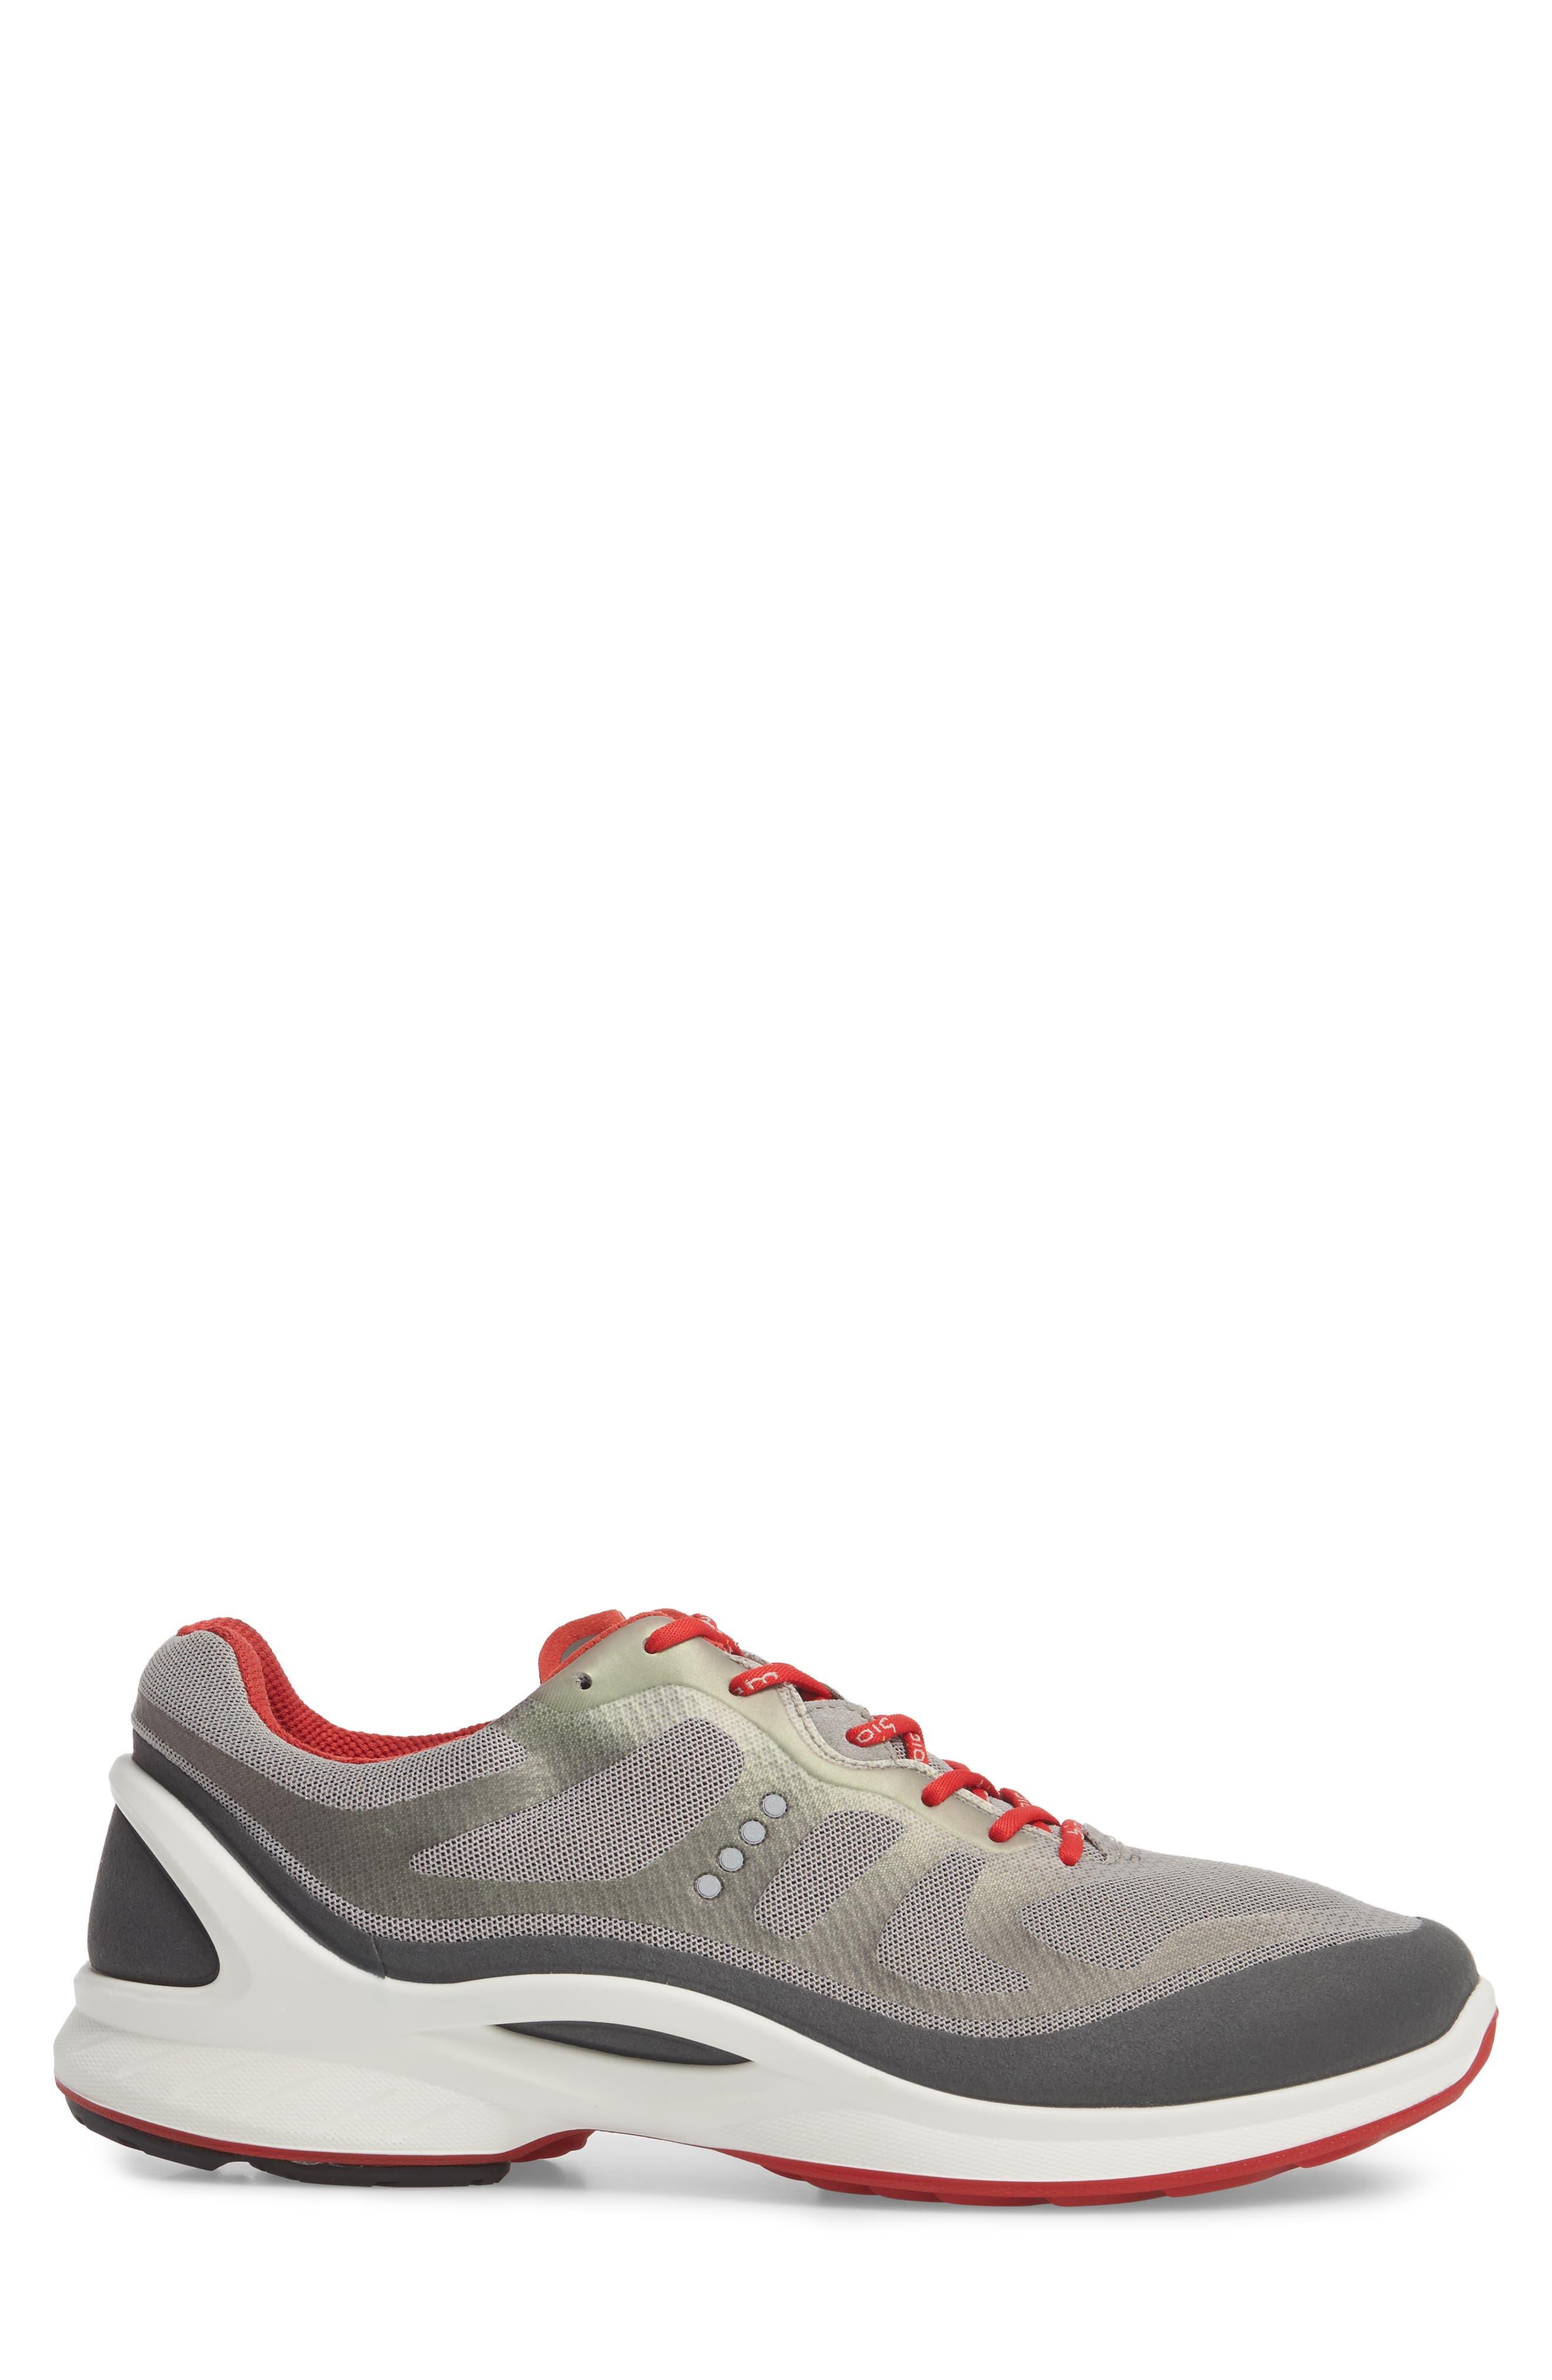 BIOM Fjuel Tie Sneaker,                             Alternate thumbnail 3, color,                             Dark Shadow/ Wild Dove Textile